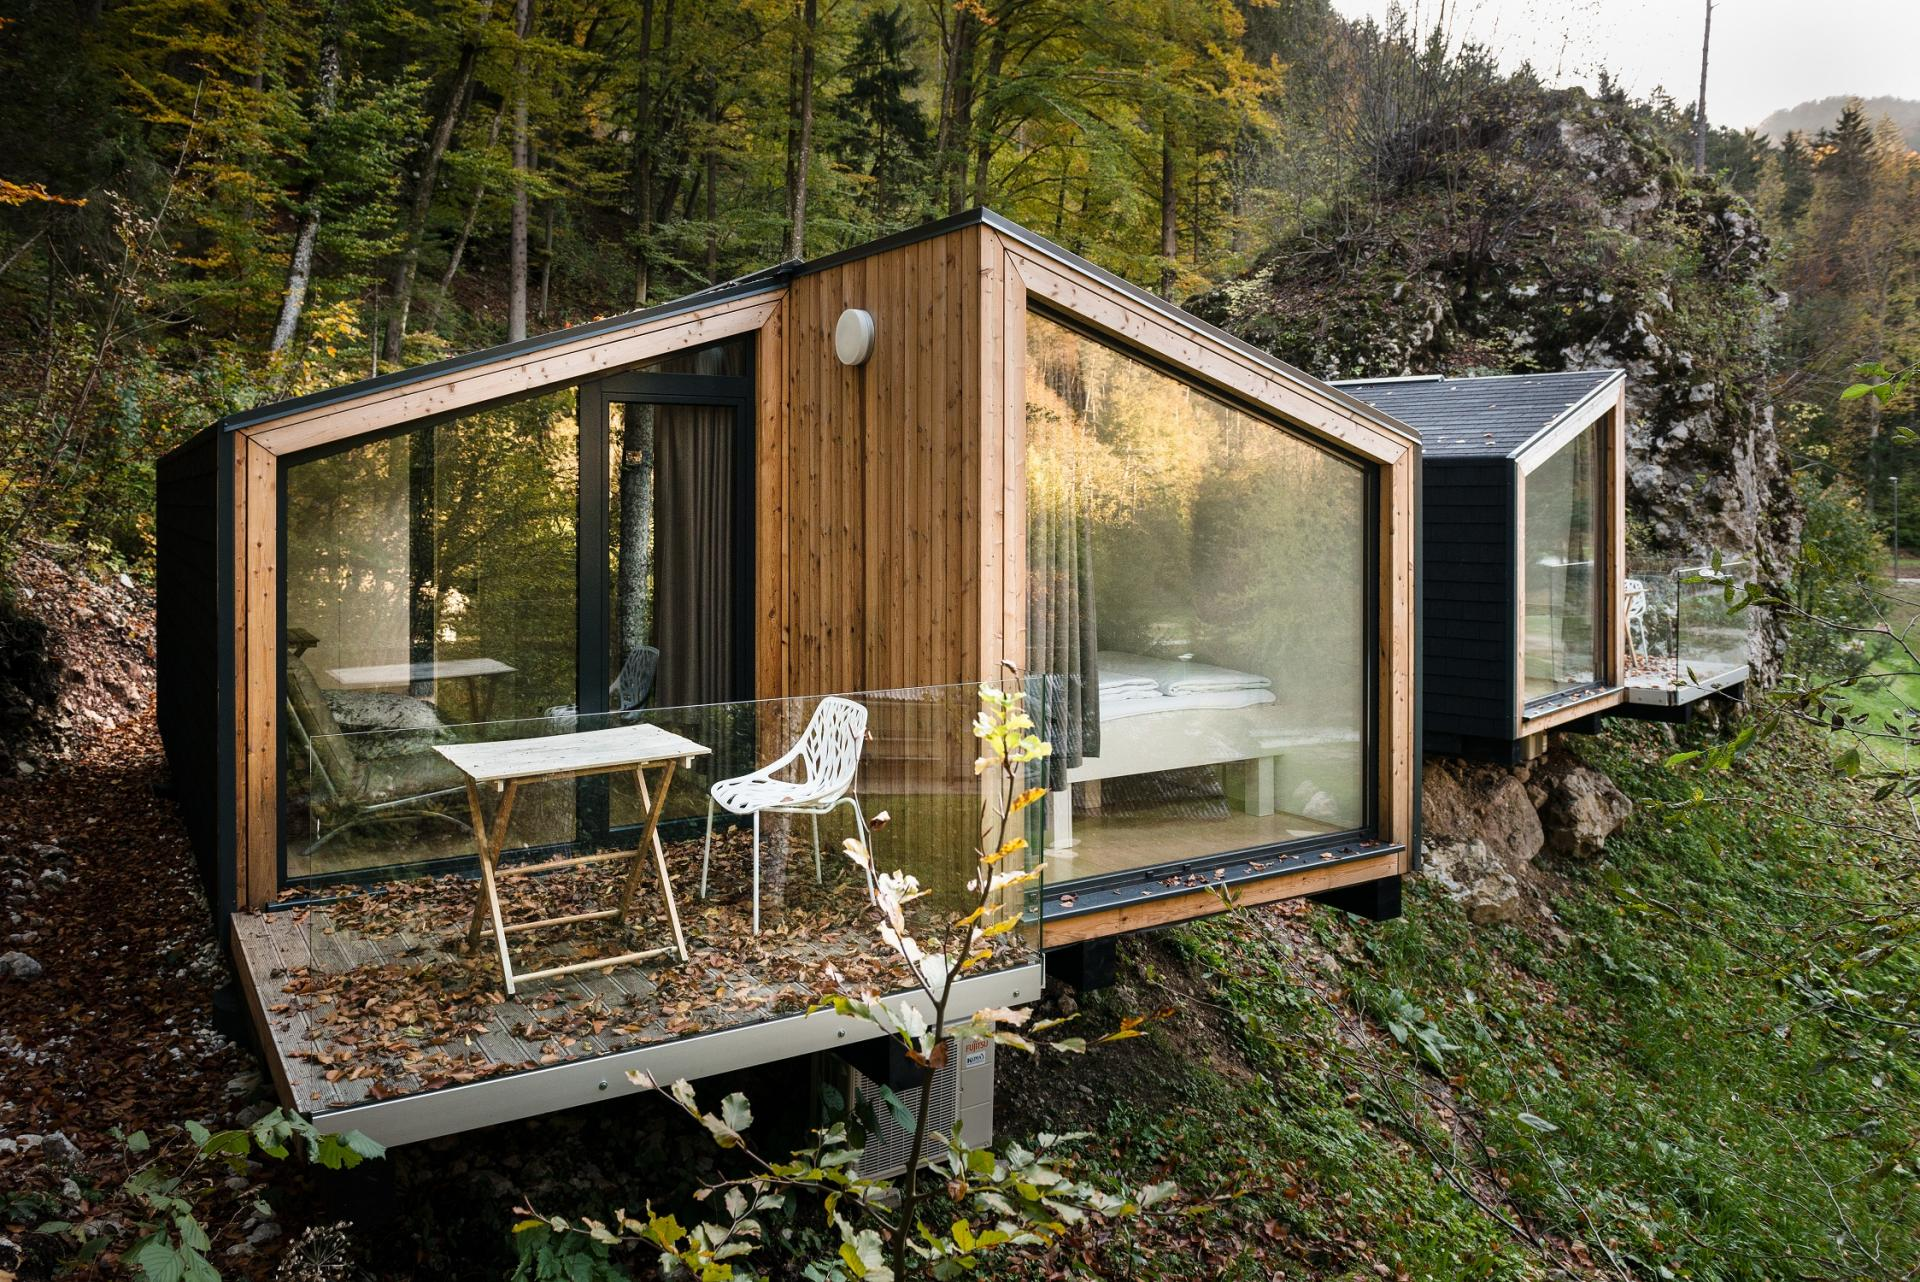 Cabane Mini Chalet Montagne Ekokoncept For 4 8 La Mini Maison Com